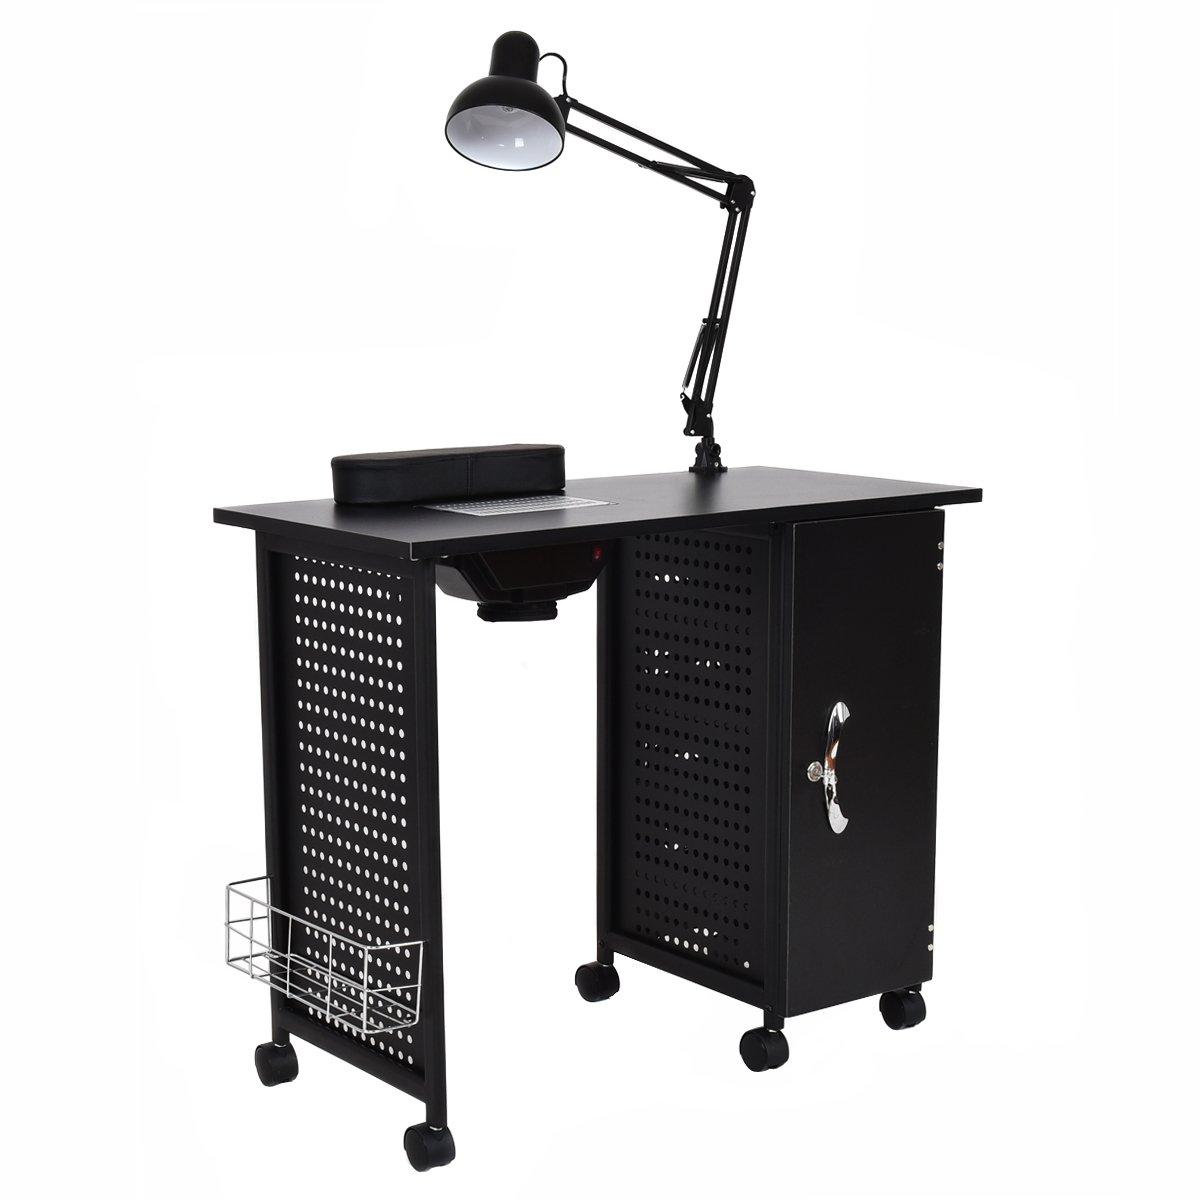 Giantex Manicure Nail Table Station Black Steel Frame Spa Salon Equipment Drawer